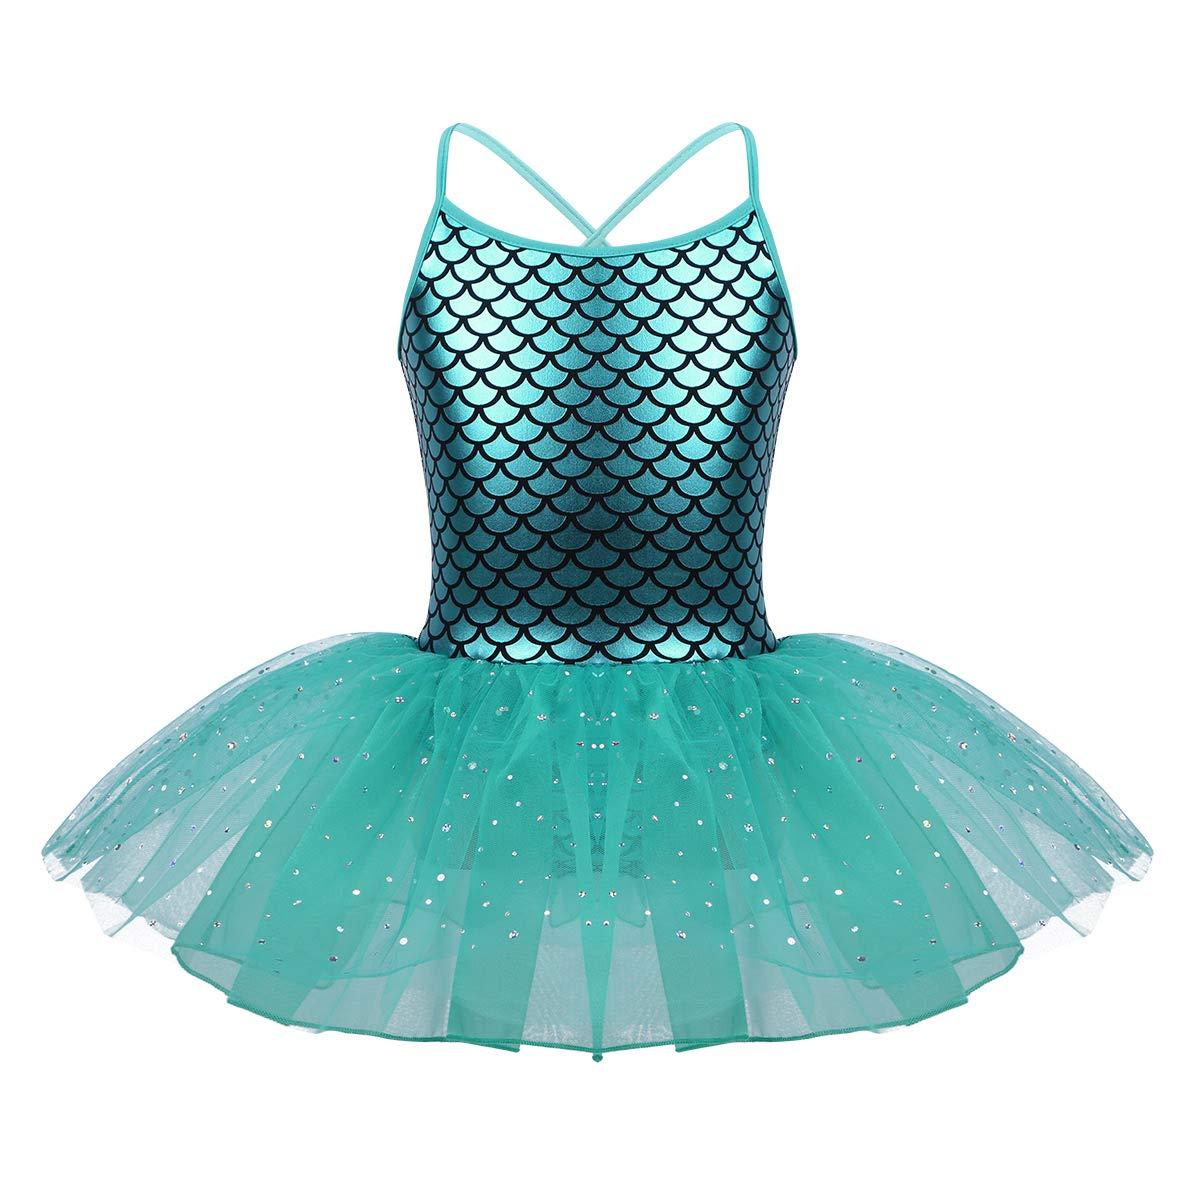 YiZYiF Kids Girl's Sequins Tutu Mermaid Costume Camisole Ballet Dance Party Dress Leotard